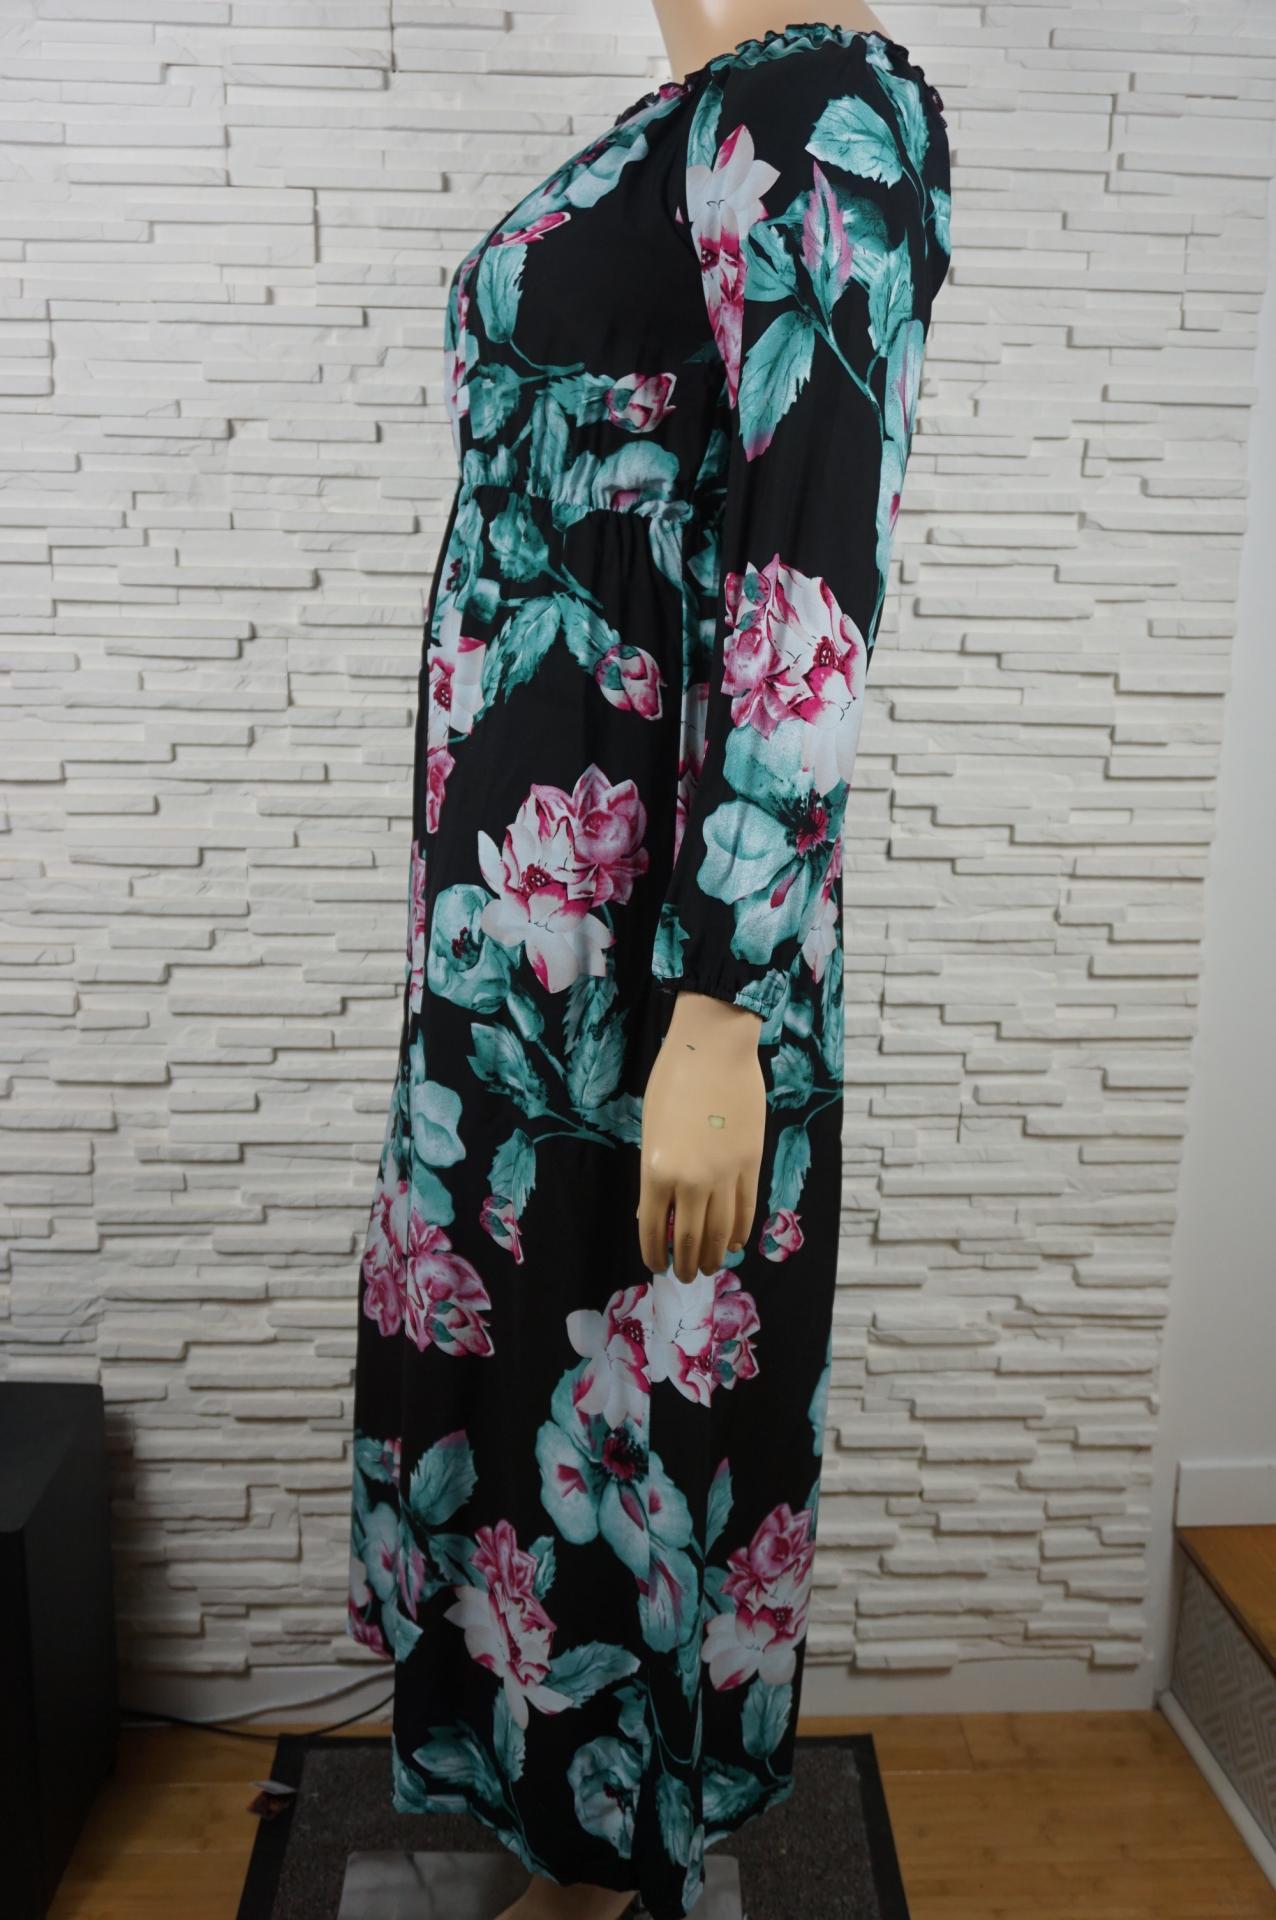 Robe longue a fleurs5